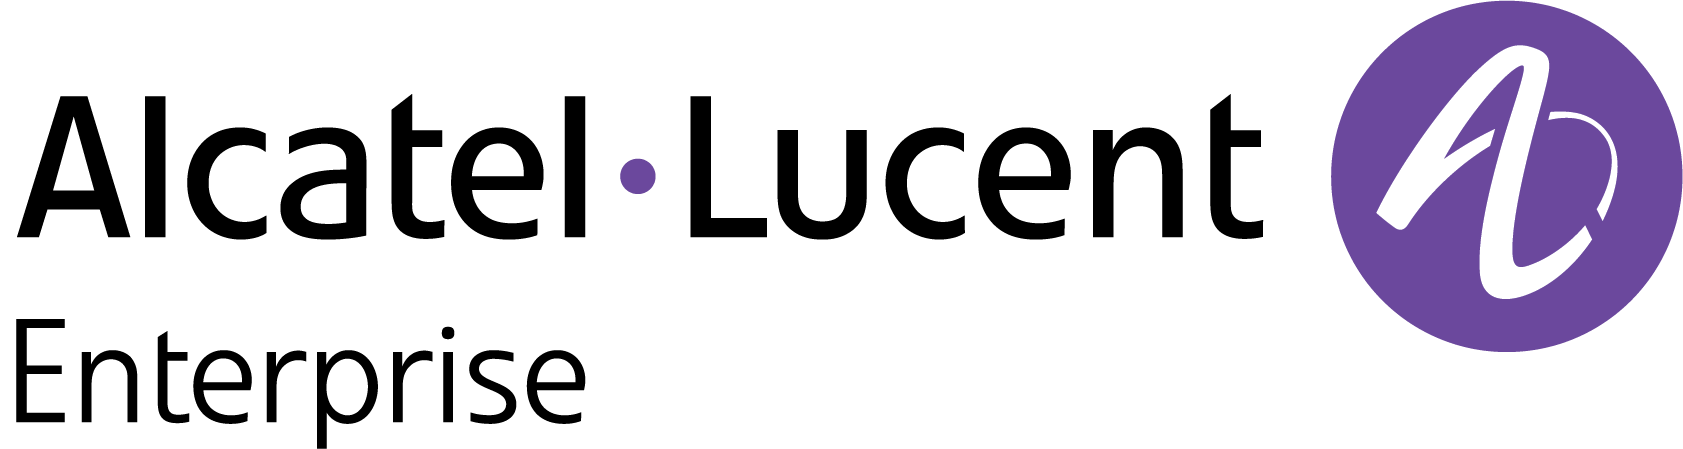 portal cautivo